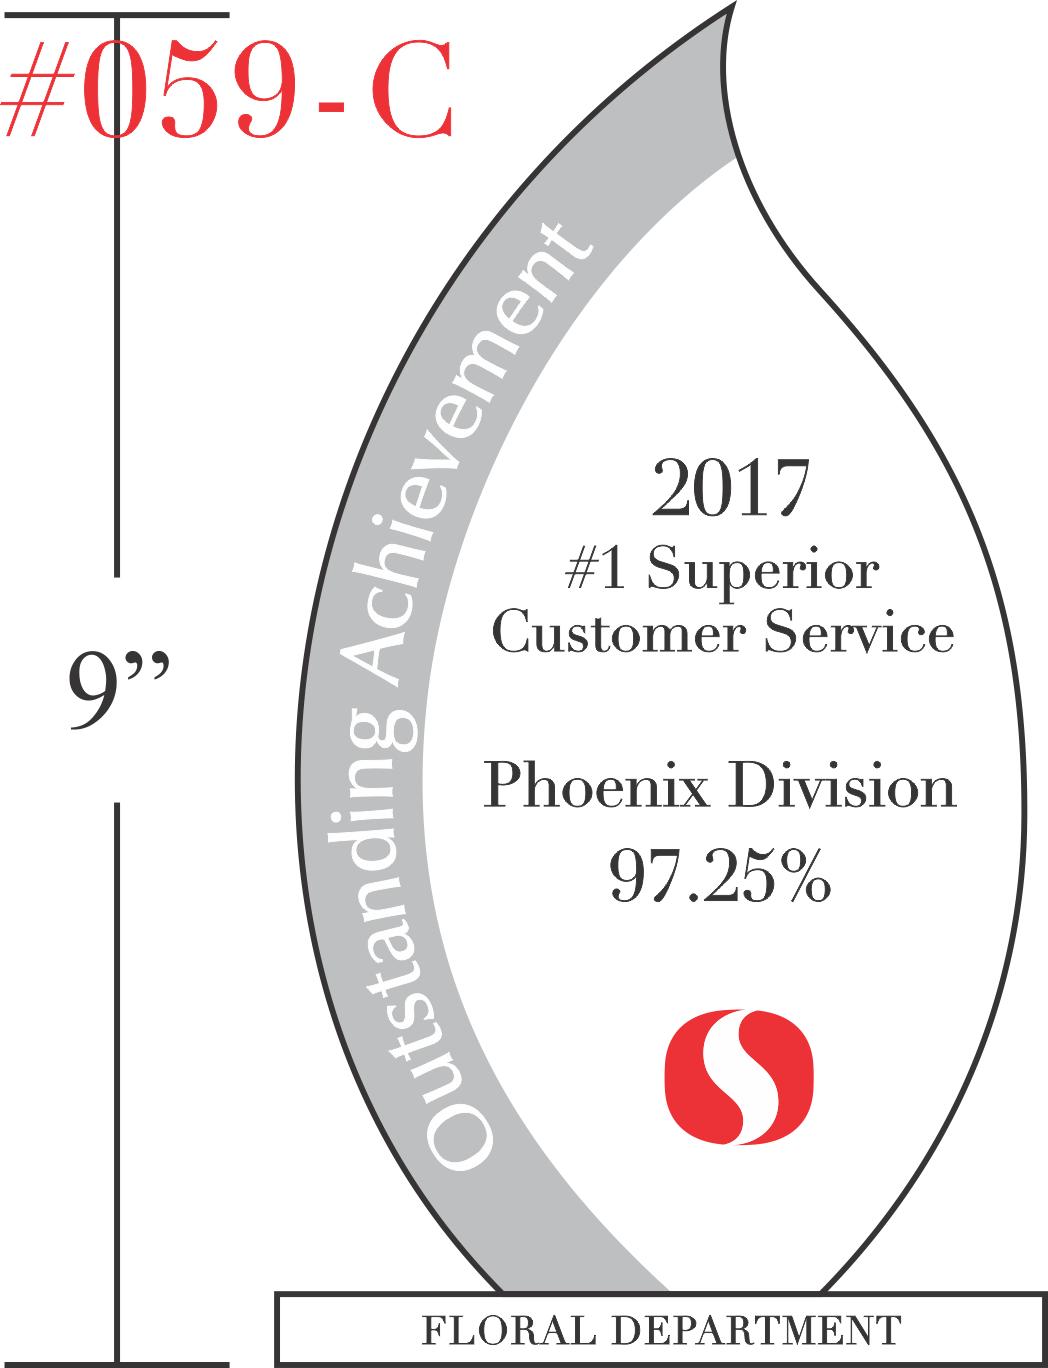 Customer Service Achievement Award